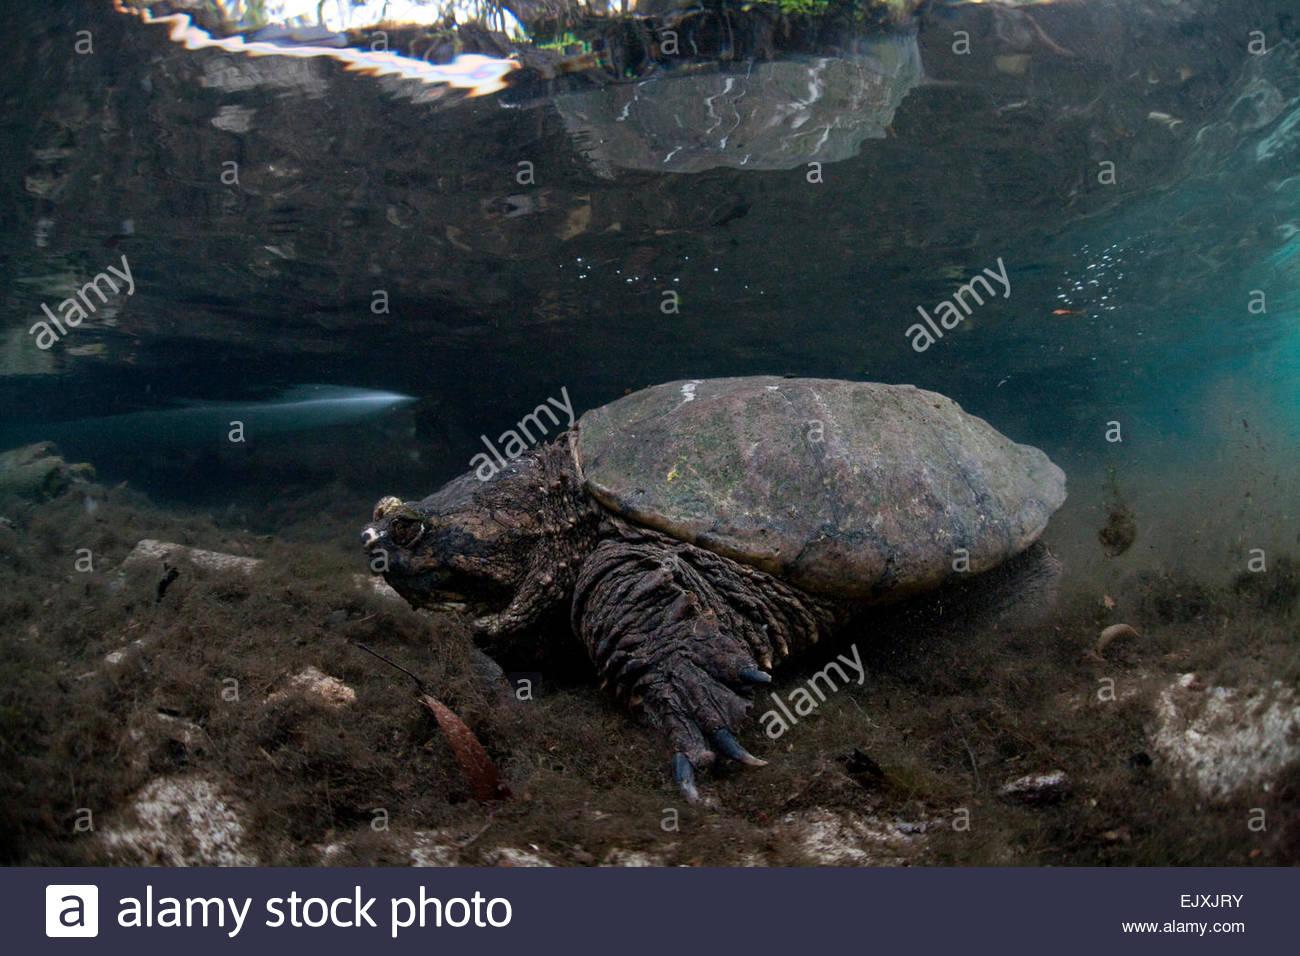 USA, Florida, Crystal River, common snapping turtle Stock Photo